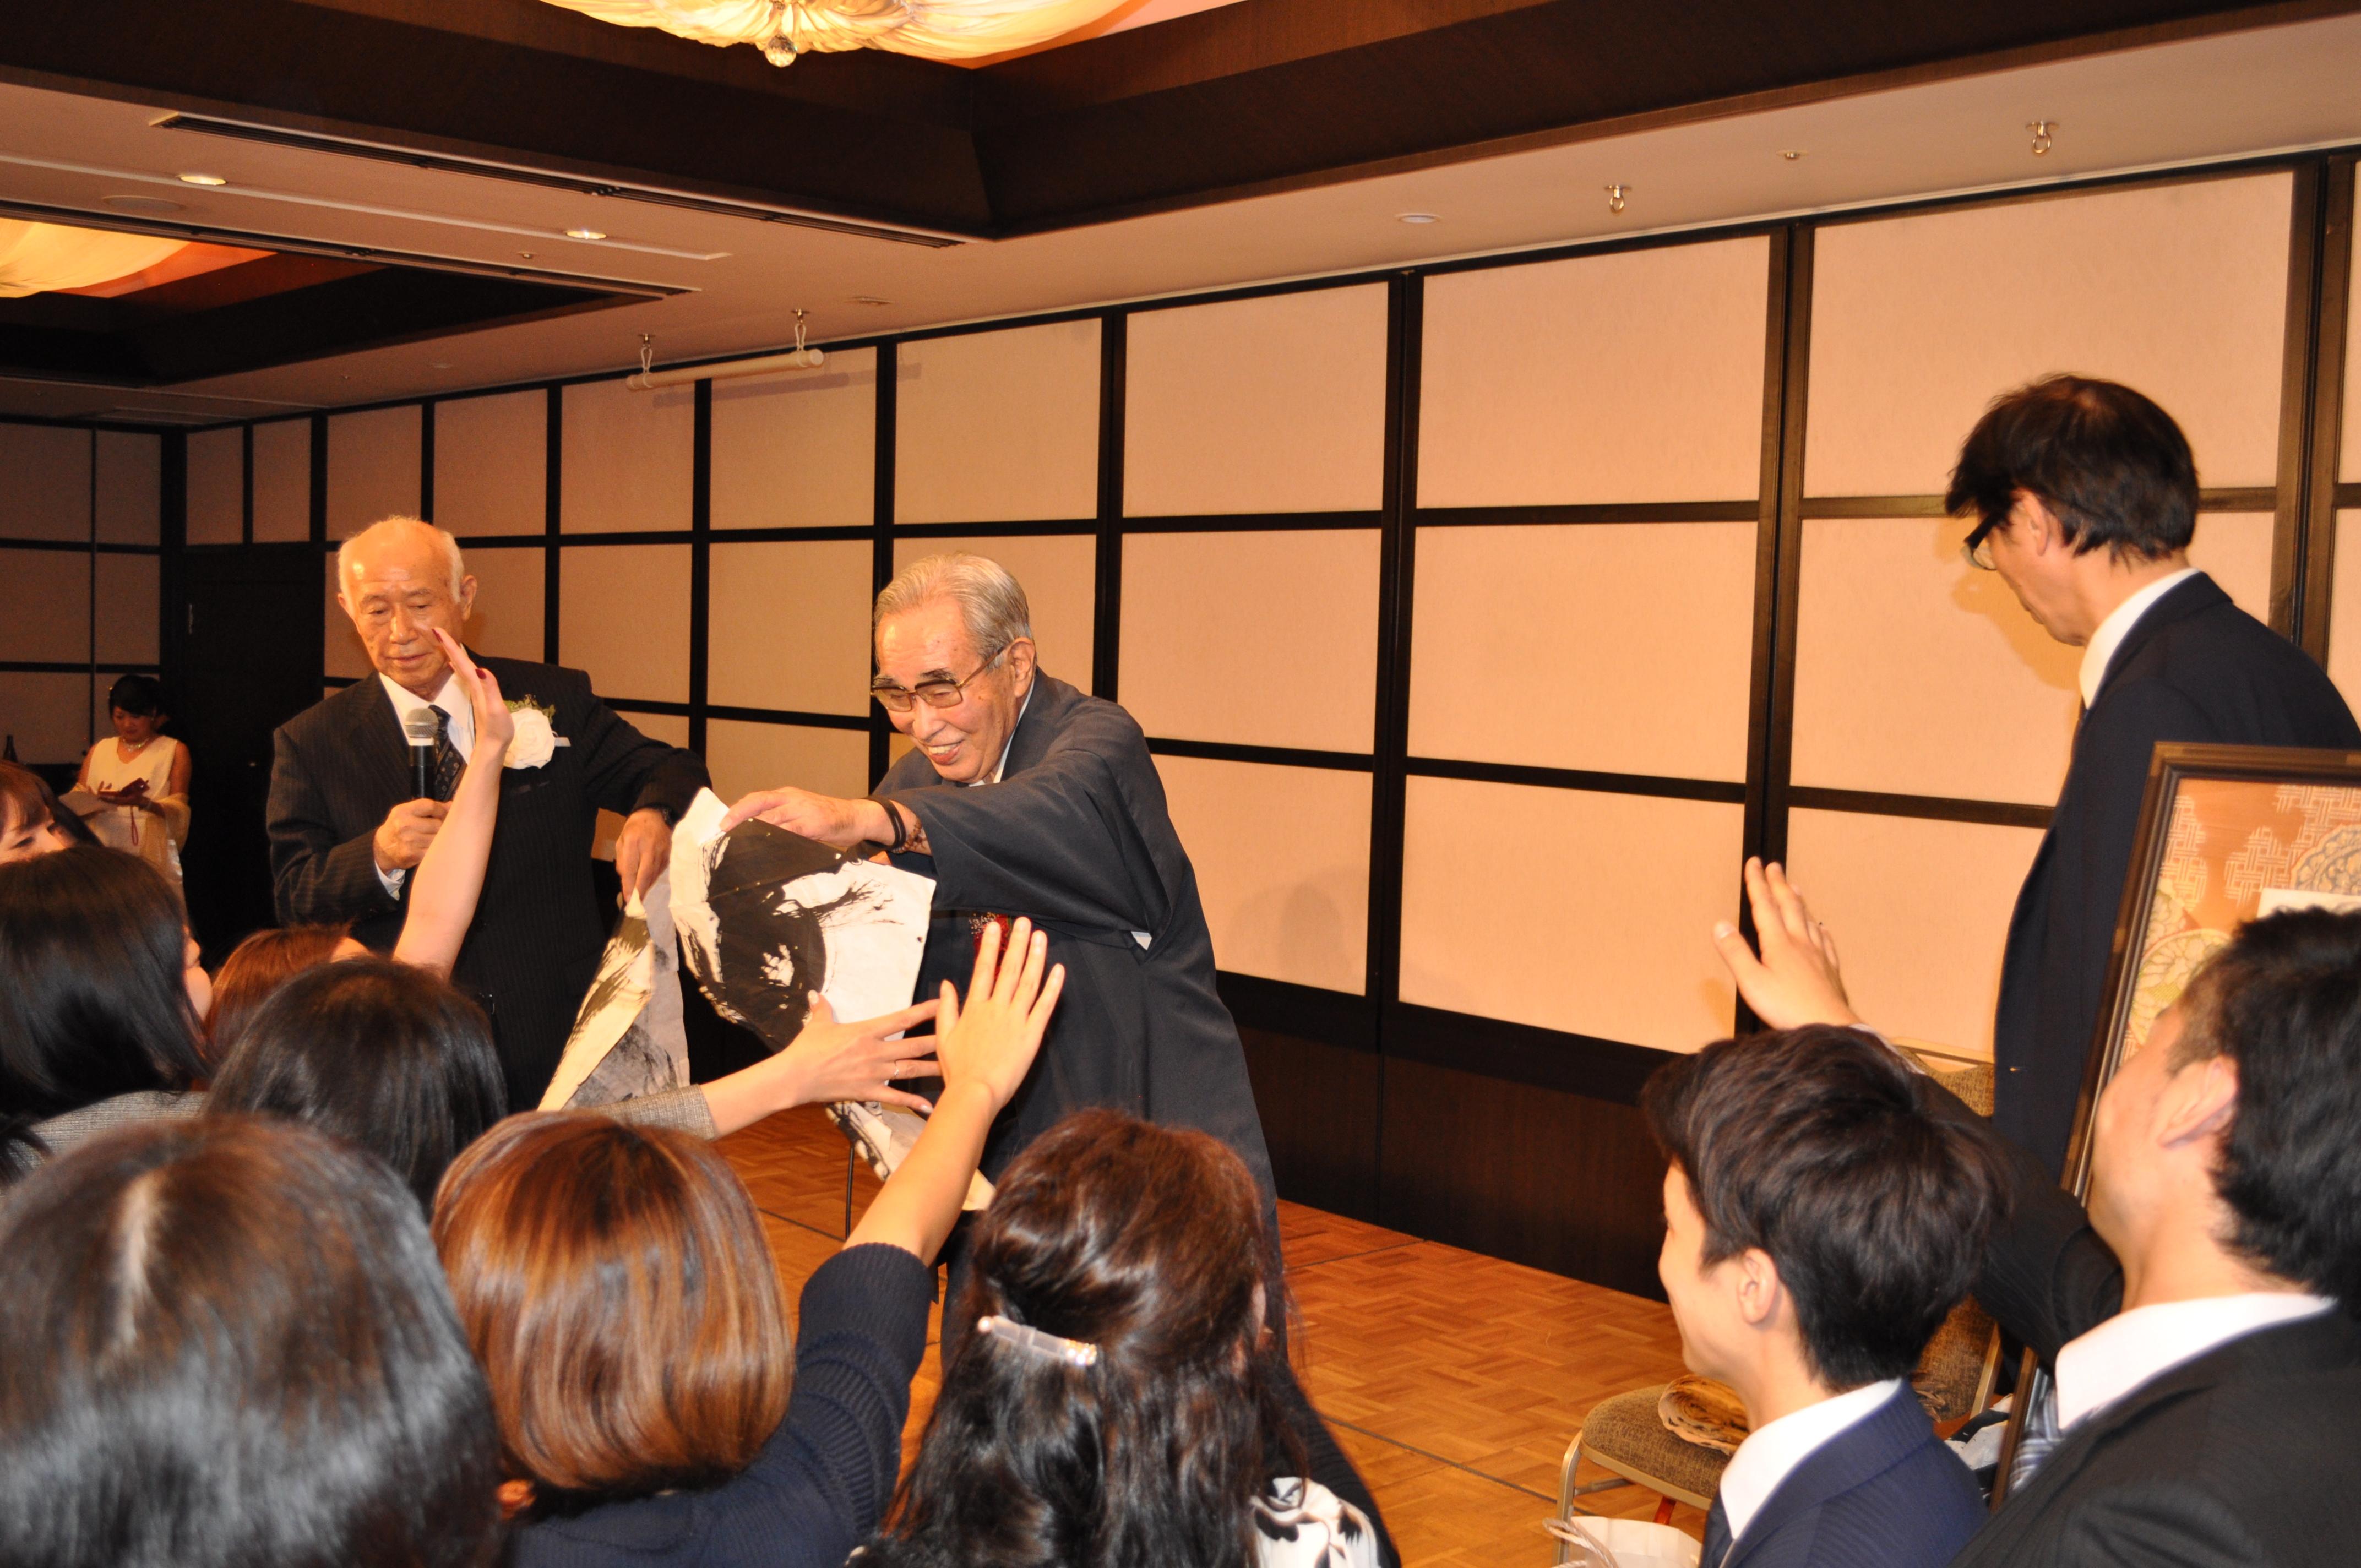 DSC 0583 - 第6回思風会全国大会2018in東京開催